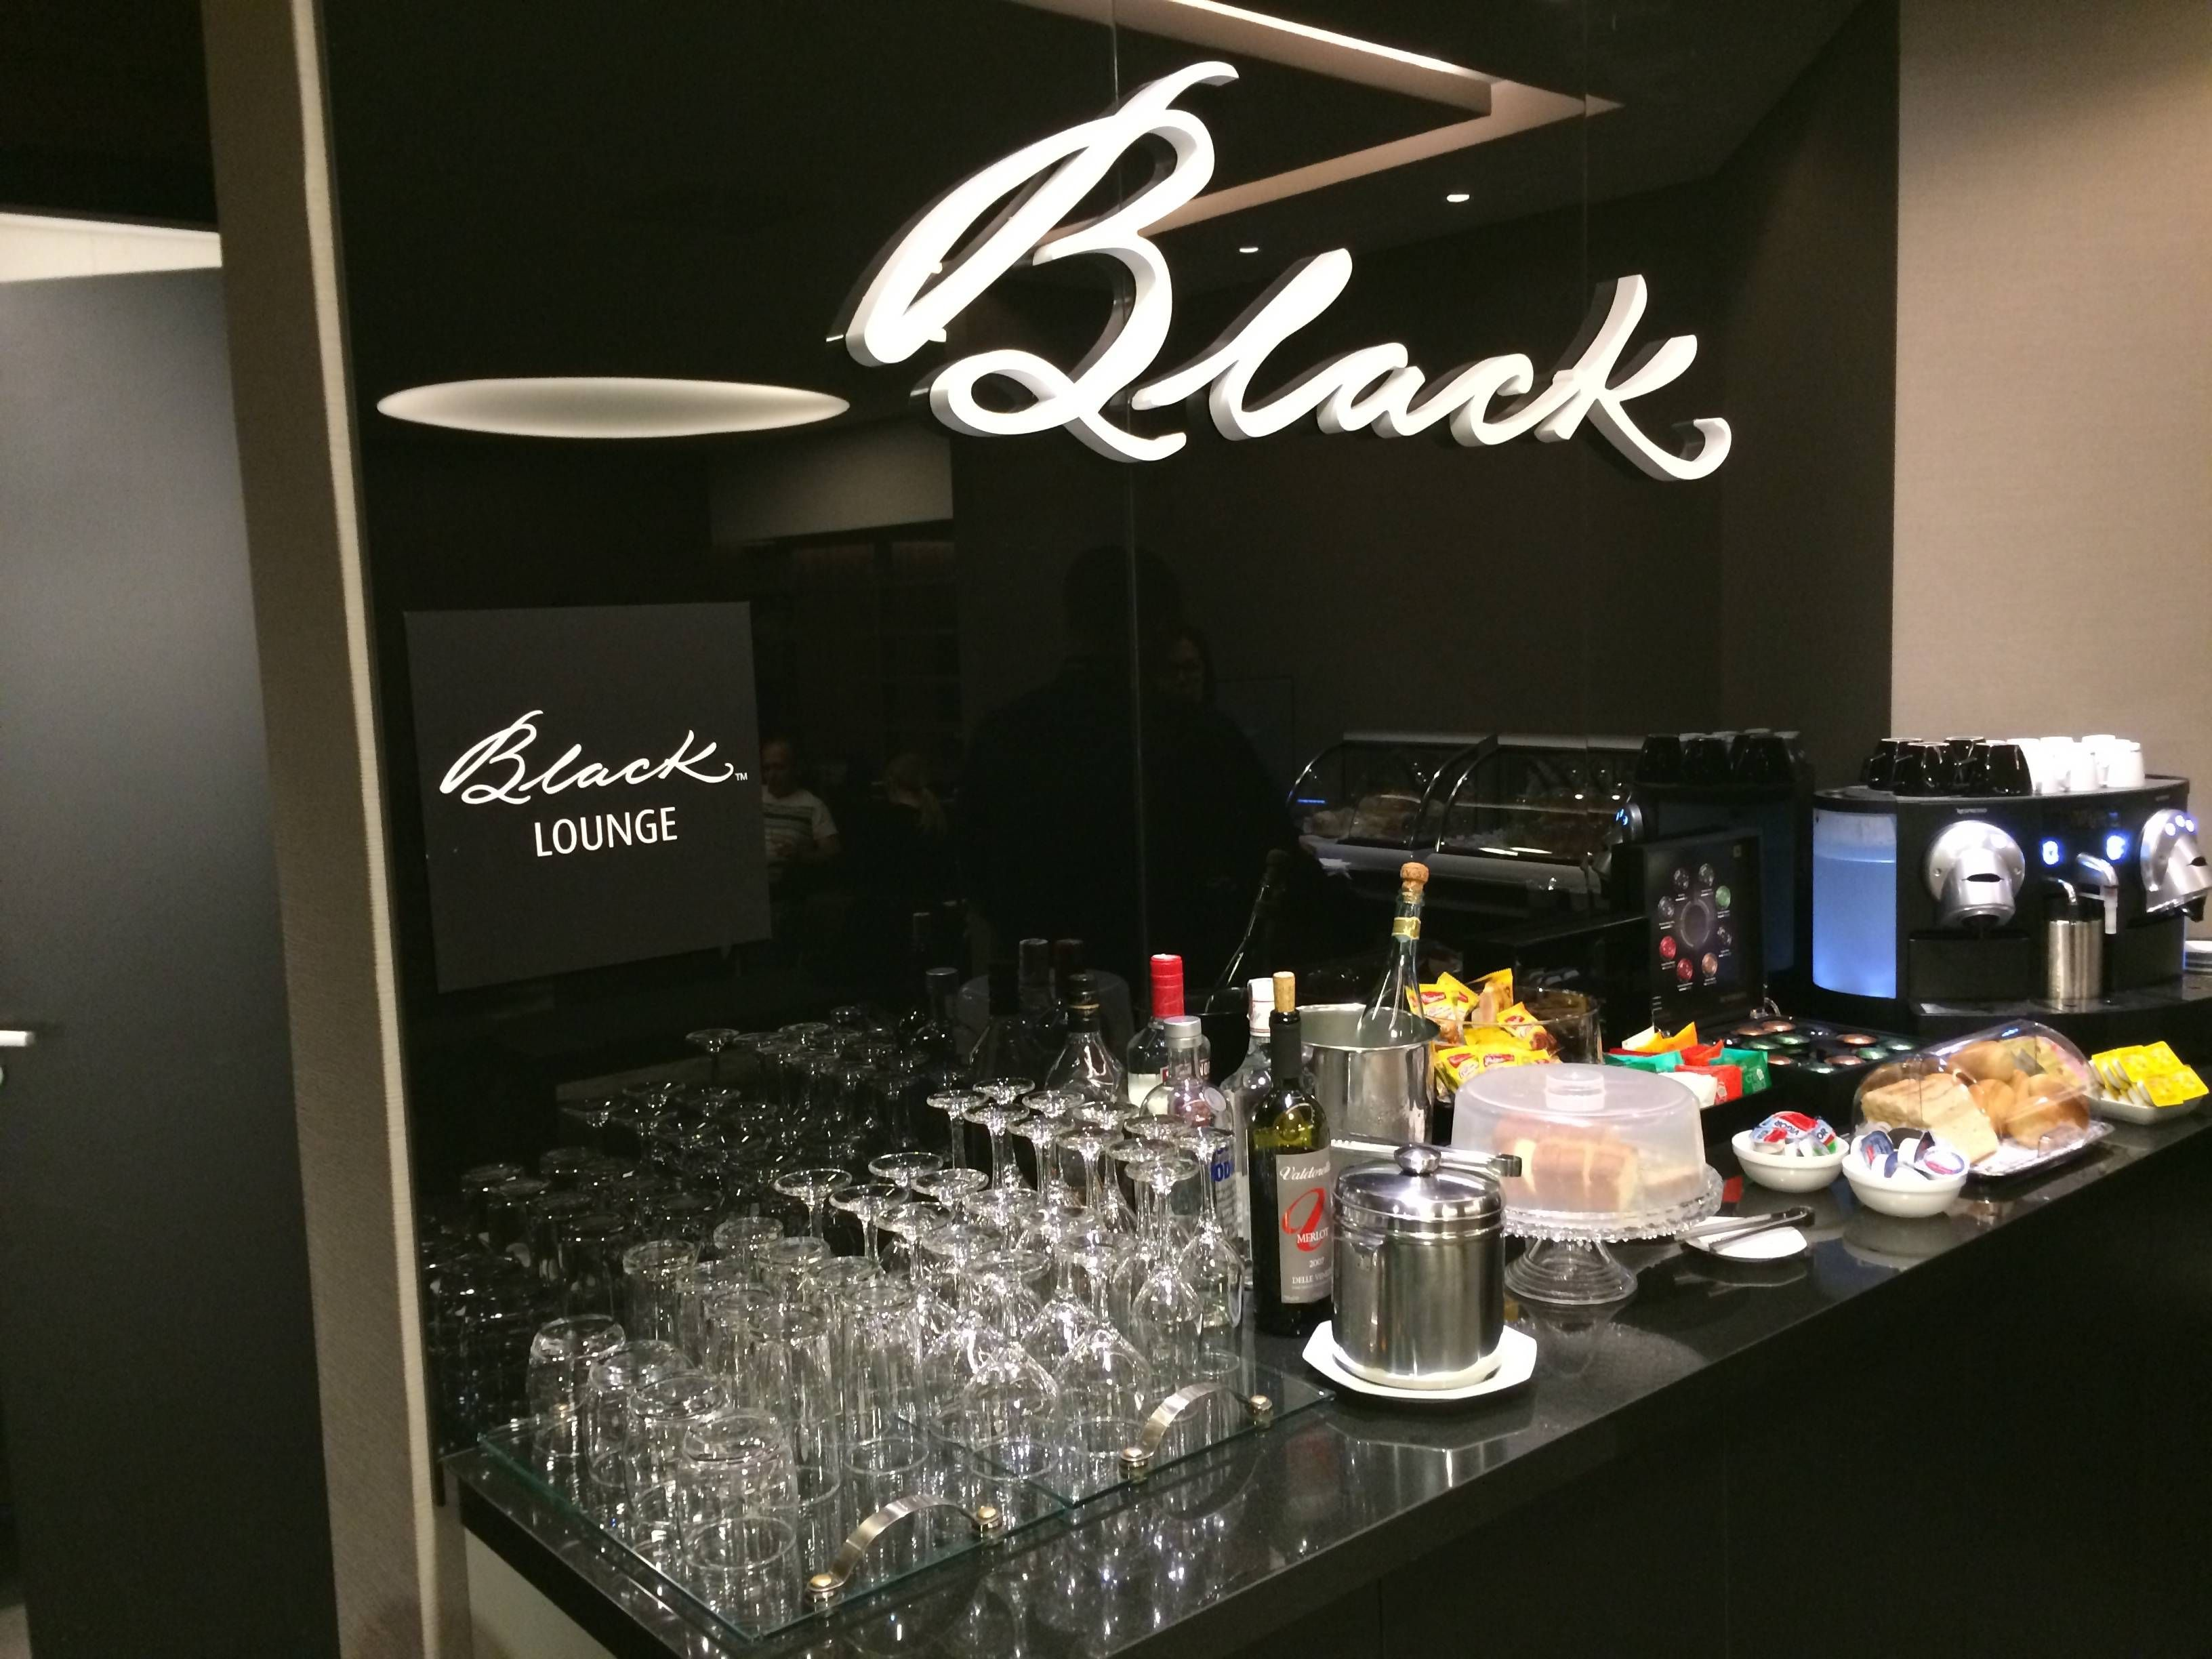 Mastercard Black Lounge no Aeroporto de Guarulhos (GRU) | Passageiro